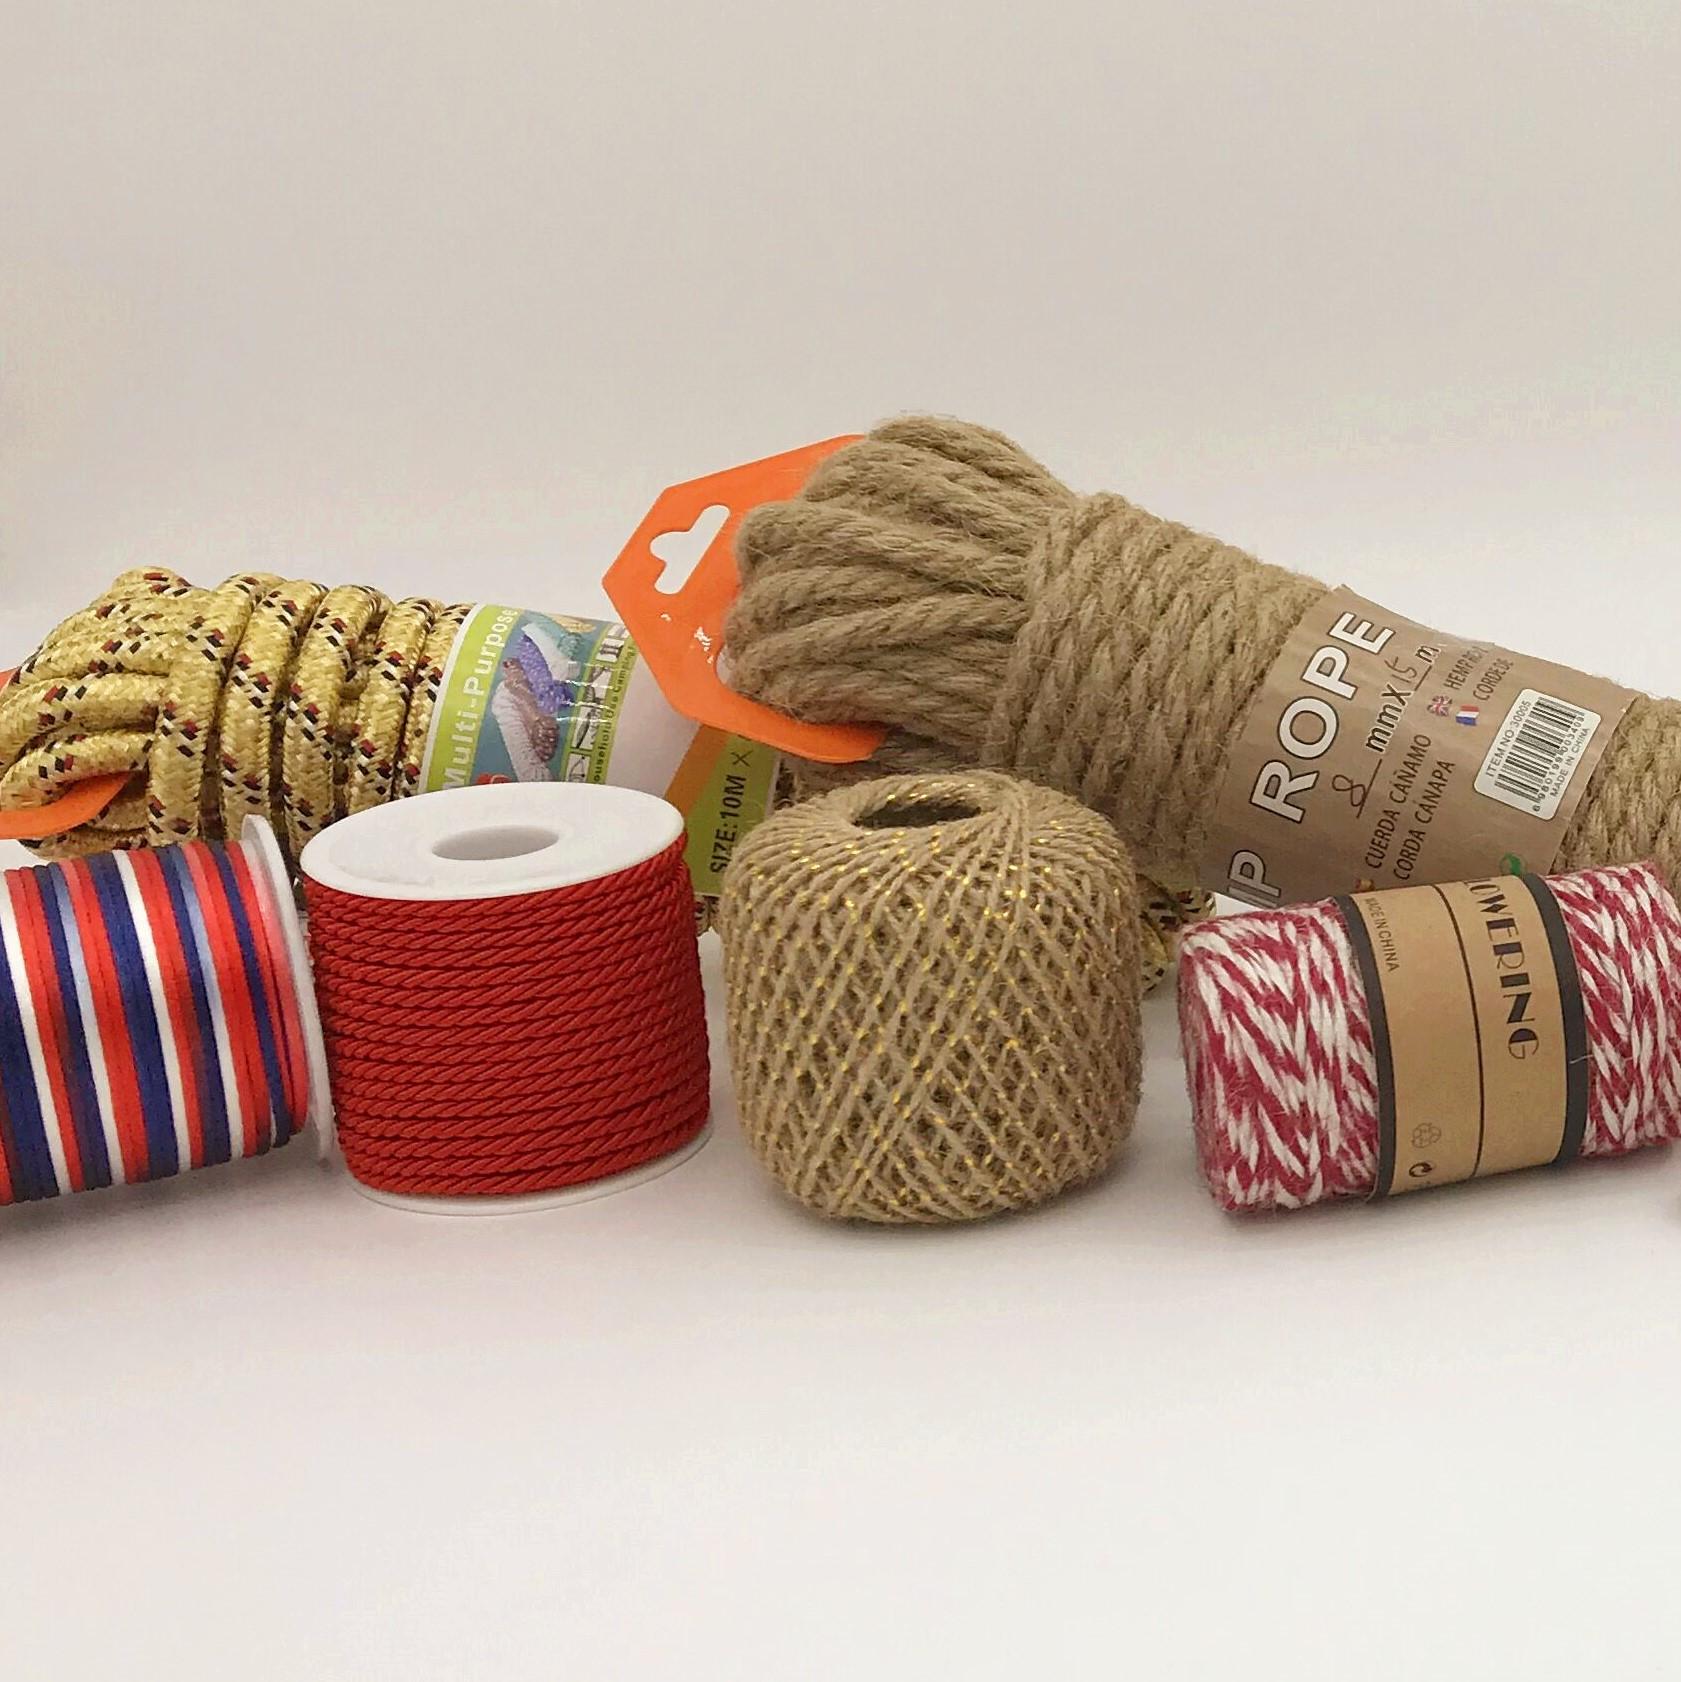 Ningbo Flowering Crafts Co., Ltd.